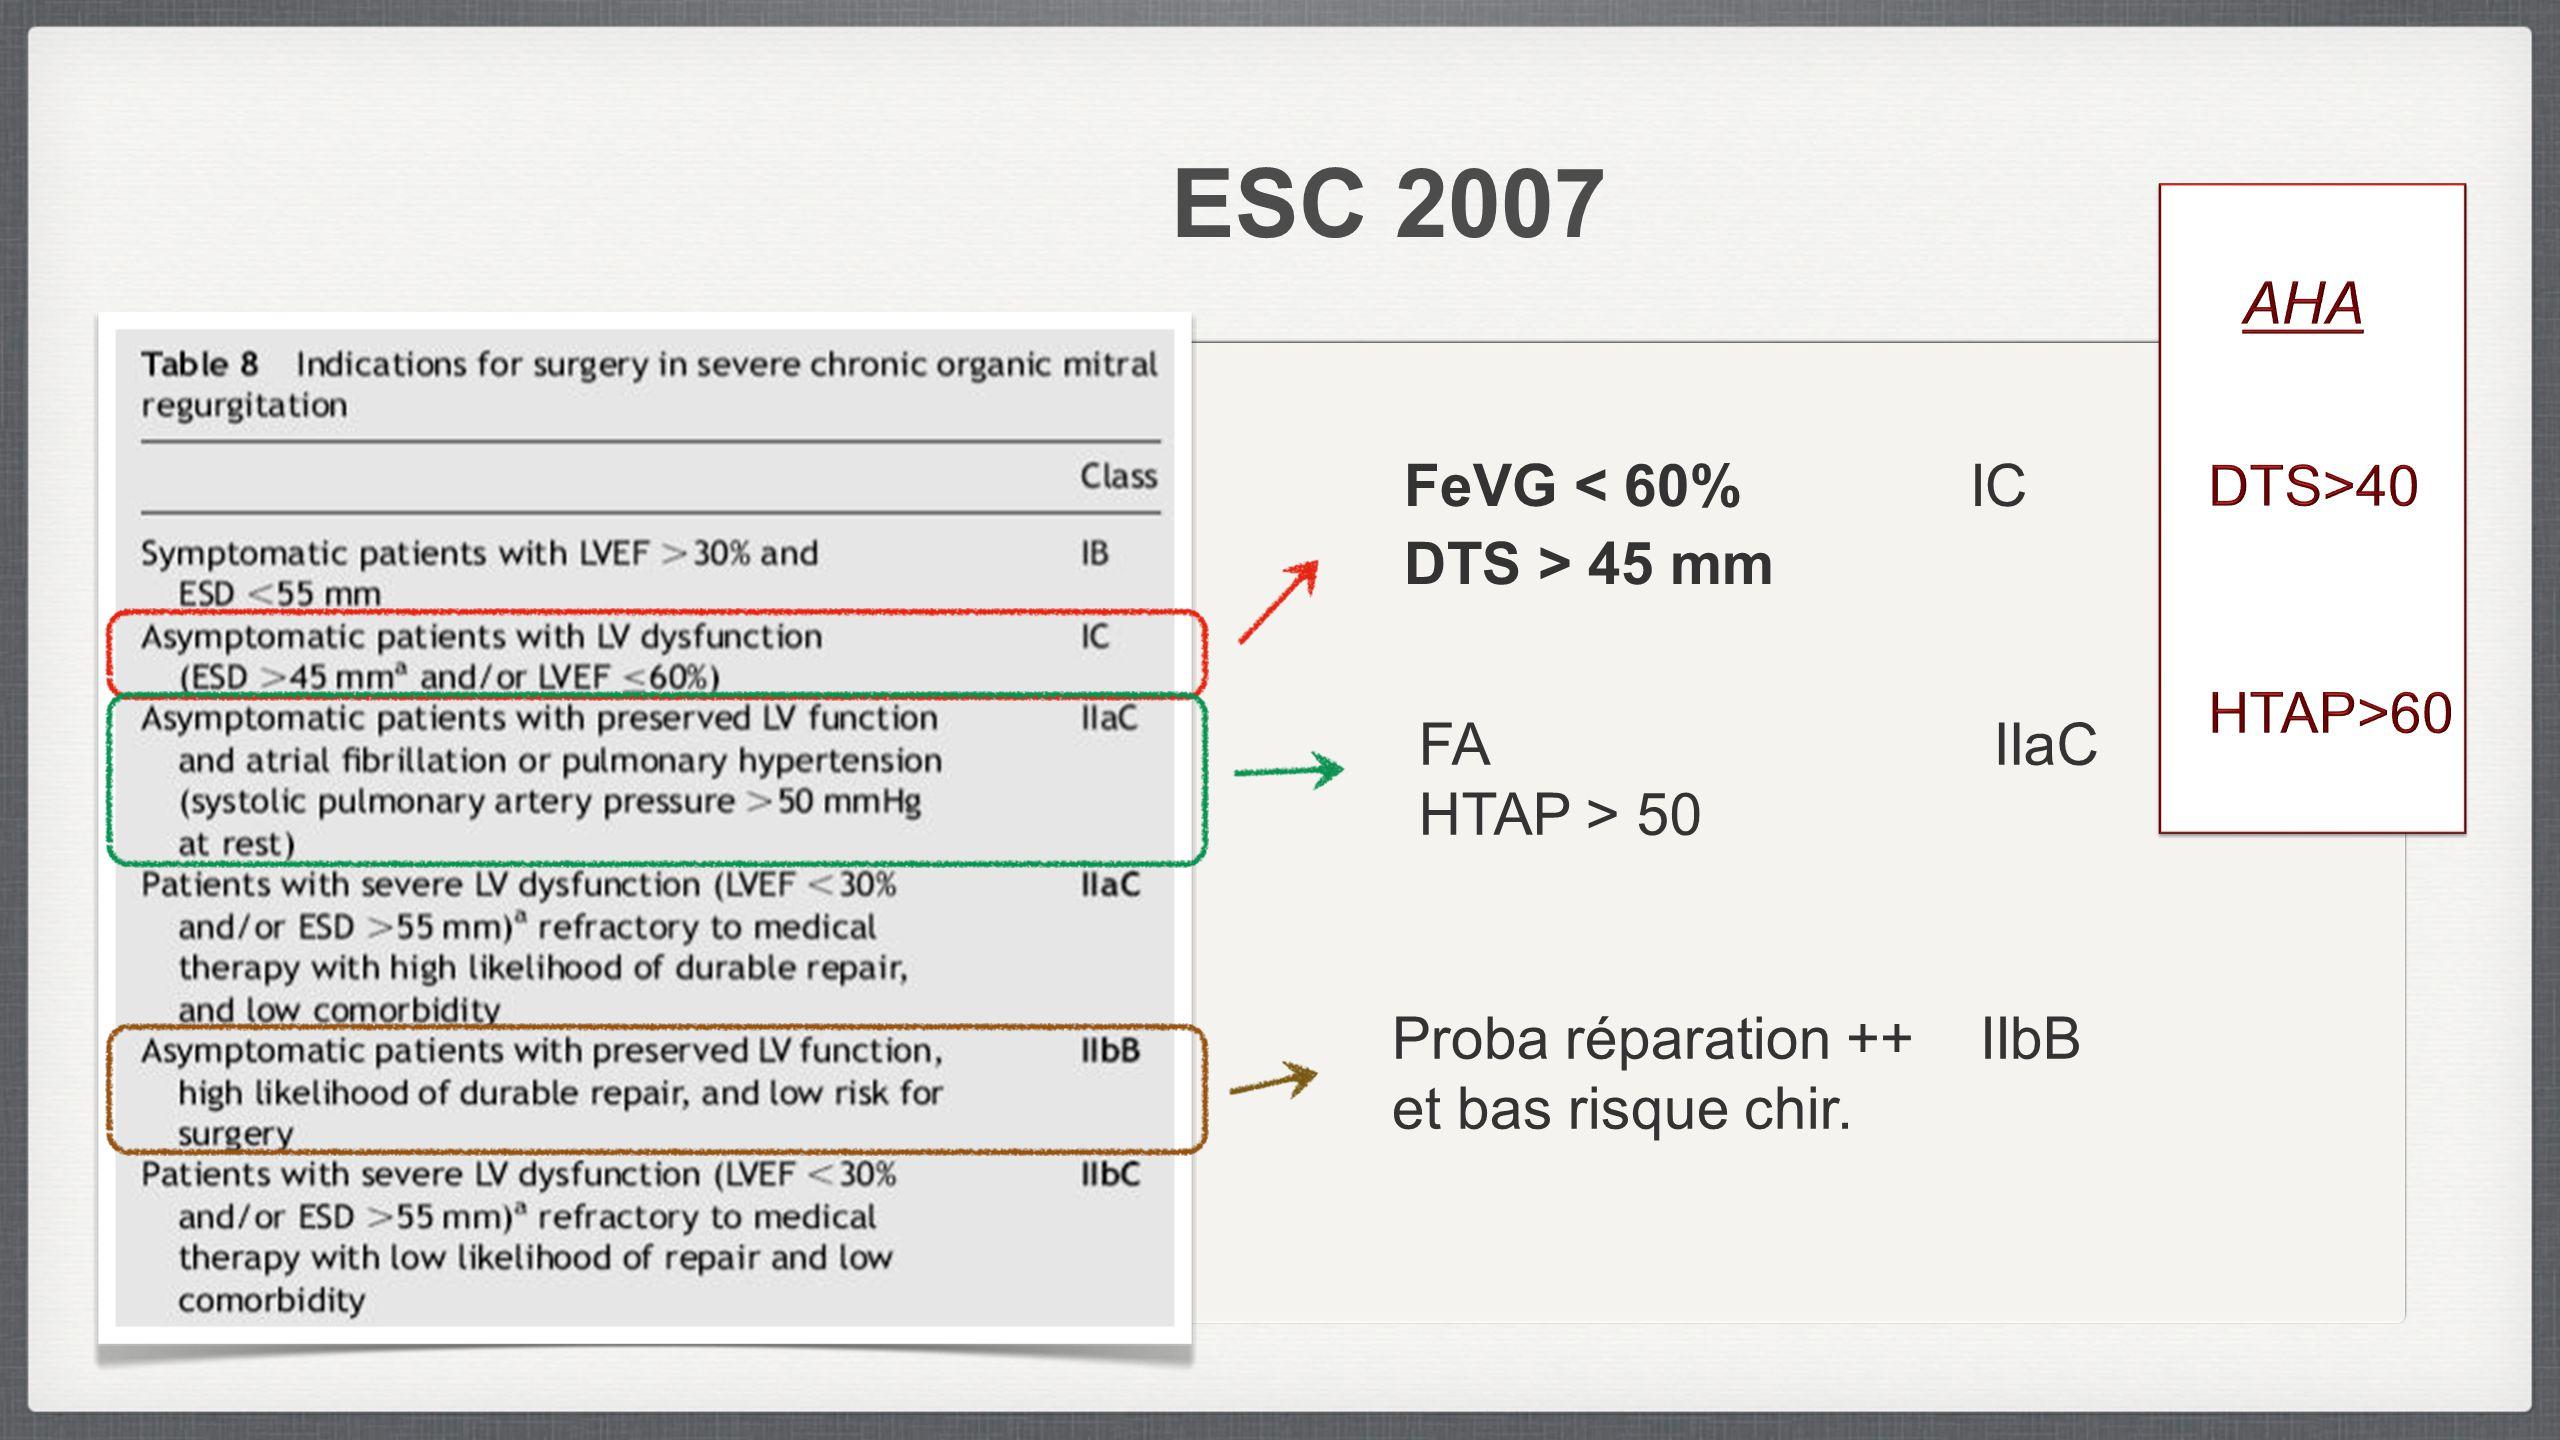 ESC 2007 FeVG < 60% IC DTS > 45 mm FA IIaC HTAP > 50 Proba réparation ++ IIbB et bas risque chir.